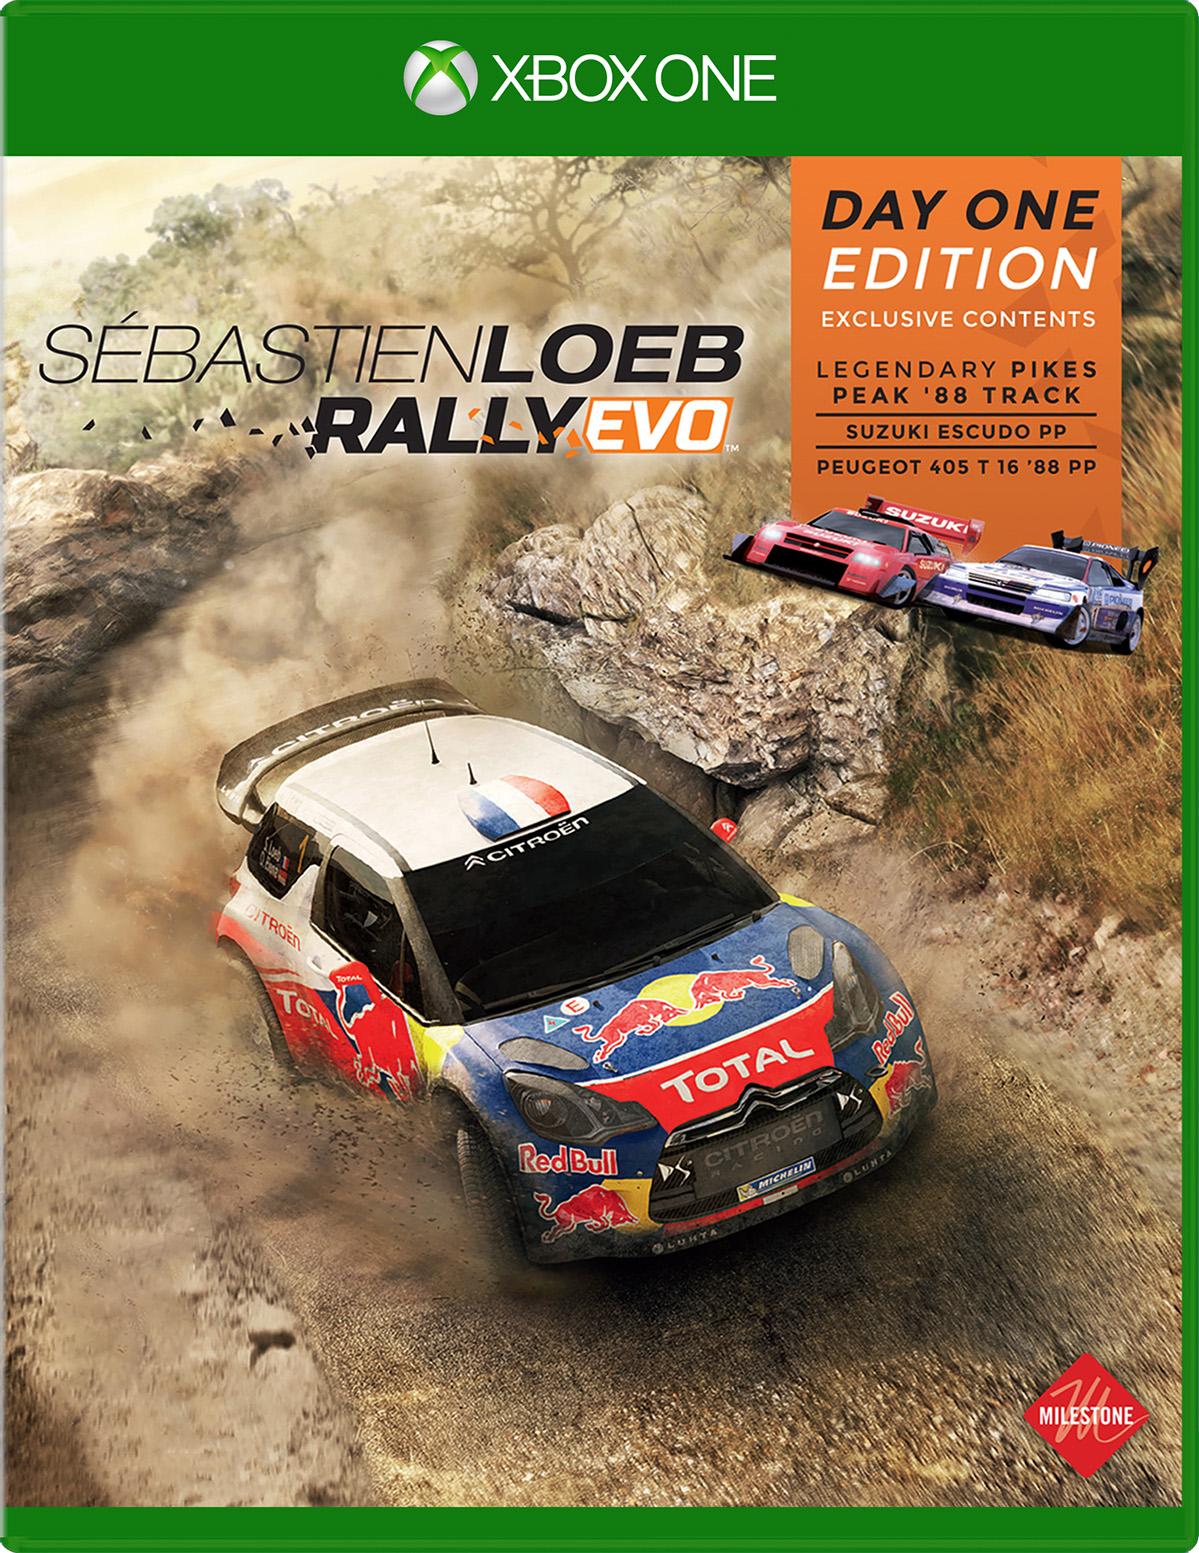 Sébastien Loeb Rally EVO Day One Edition for Xbox One